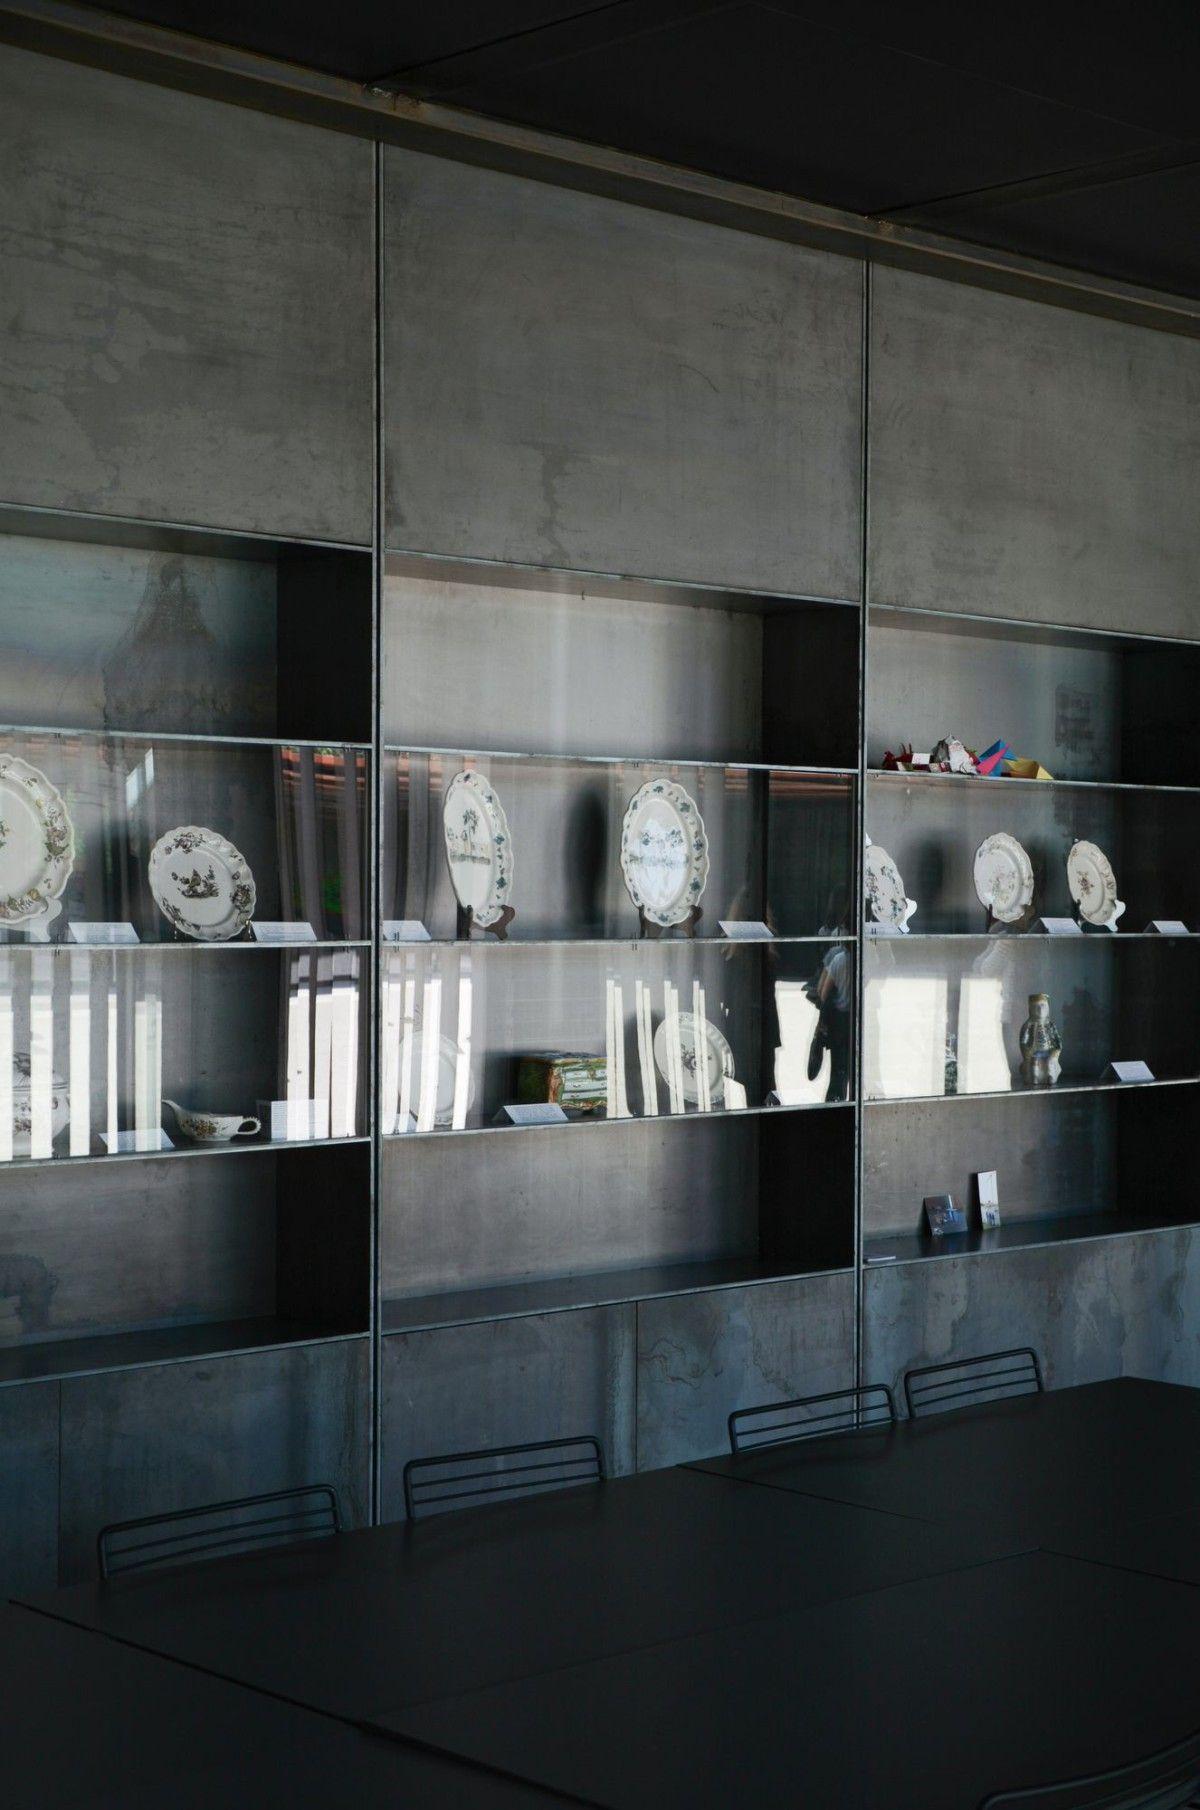 Rcr La Cuisine Art Center Negrepelisse 17 Architectural